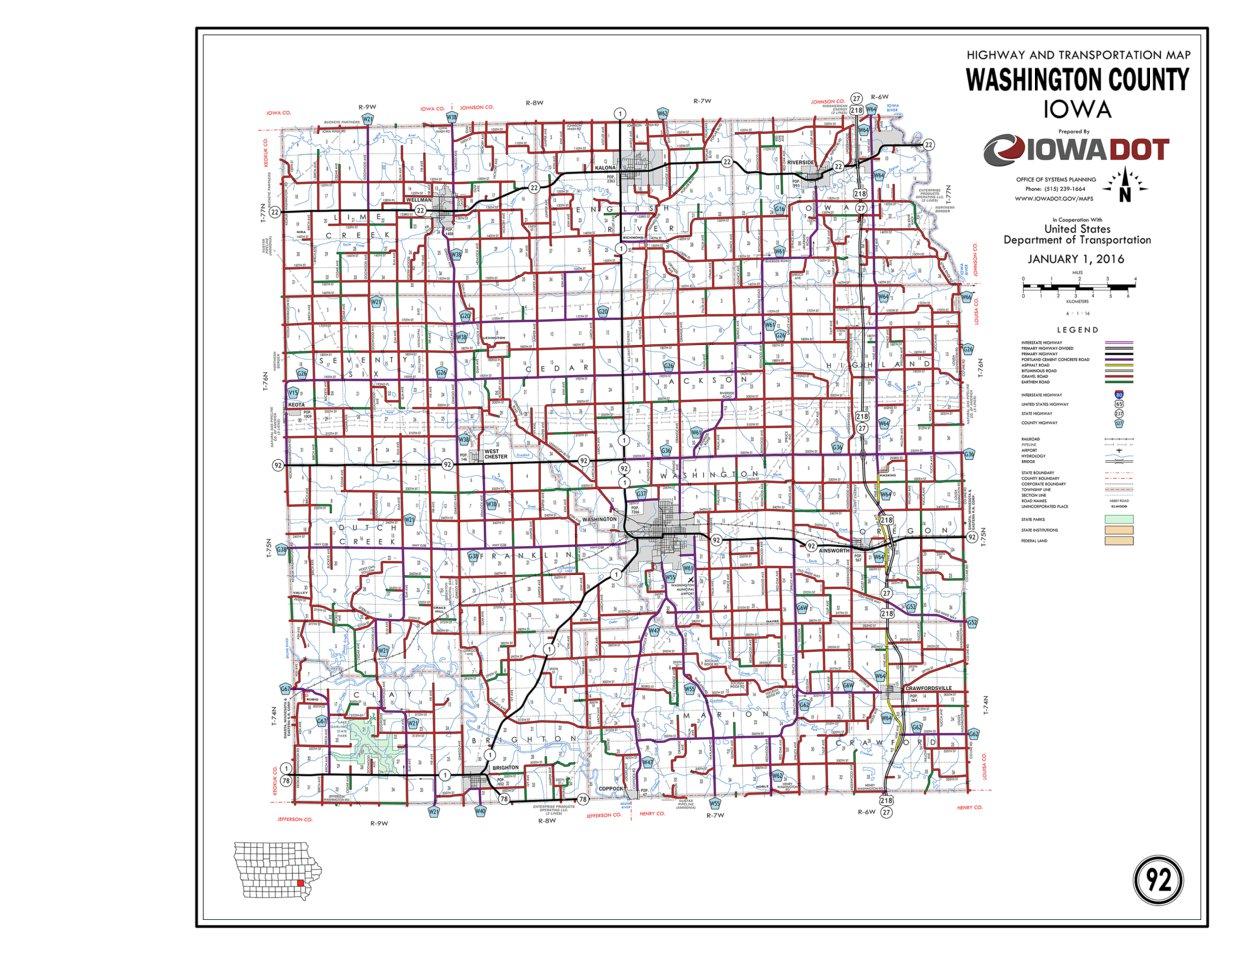 Washington County Iowa Map.Washington County Iowa Iowa Department Of Transportation Avenza